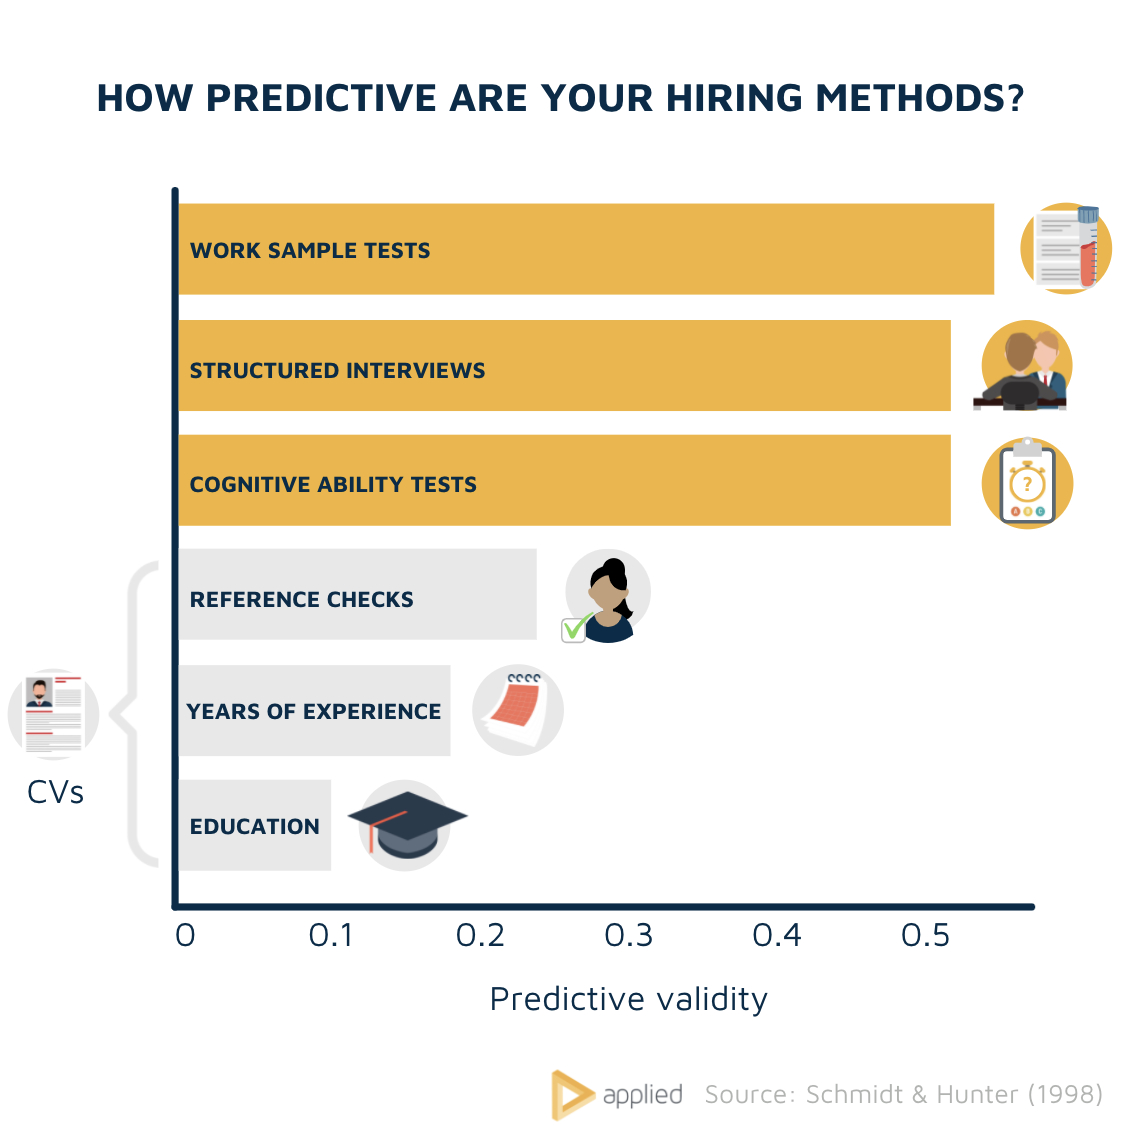 Predictive validity of hiring methods (chart)